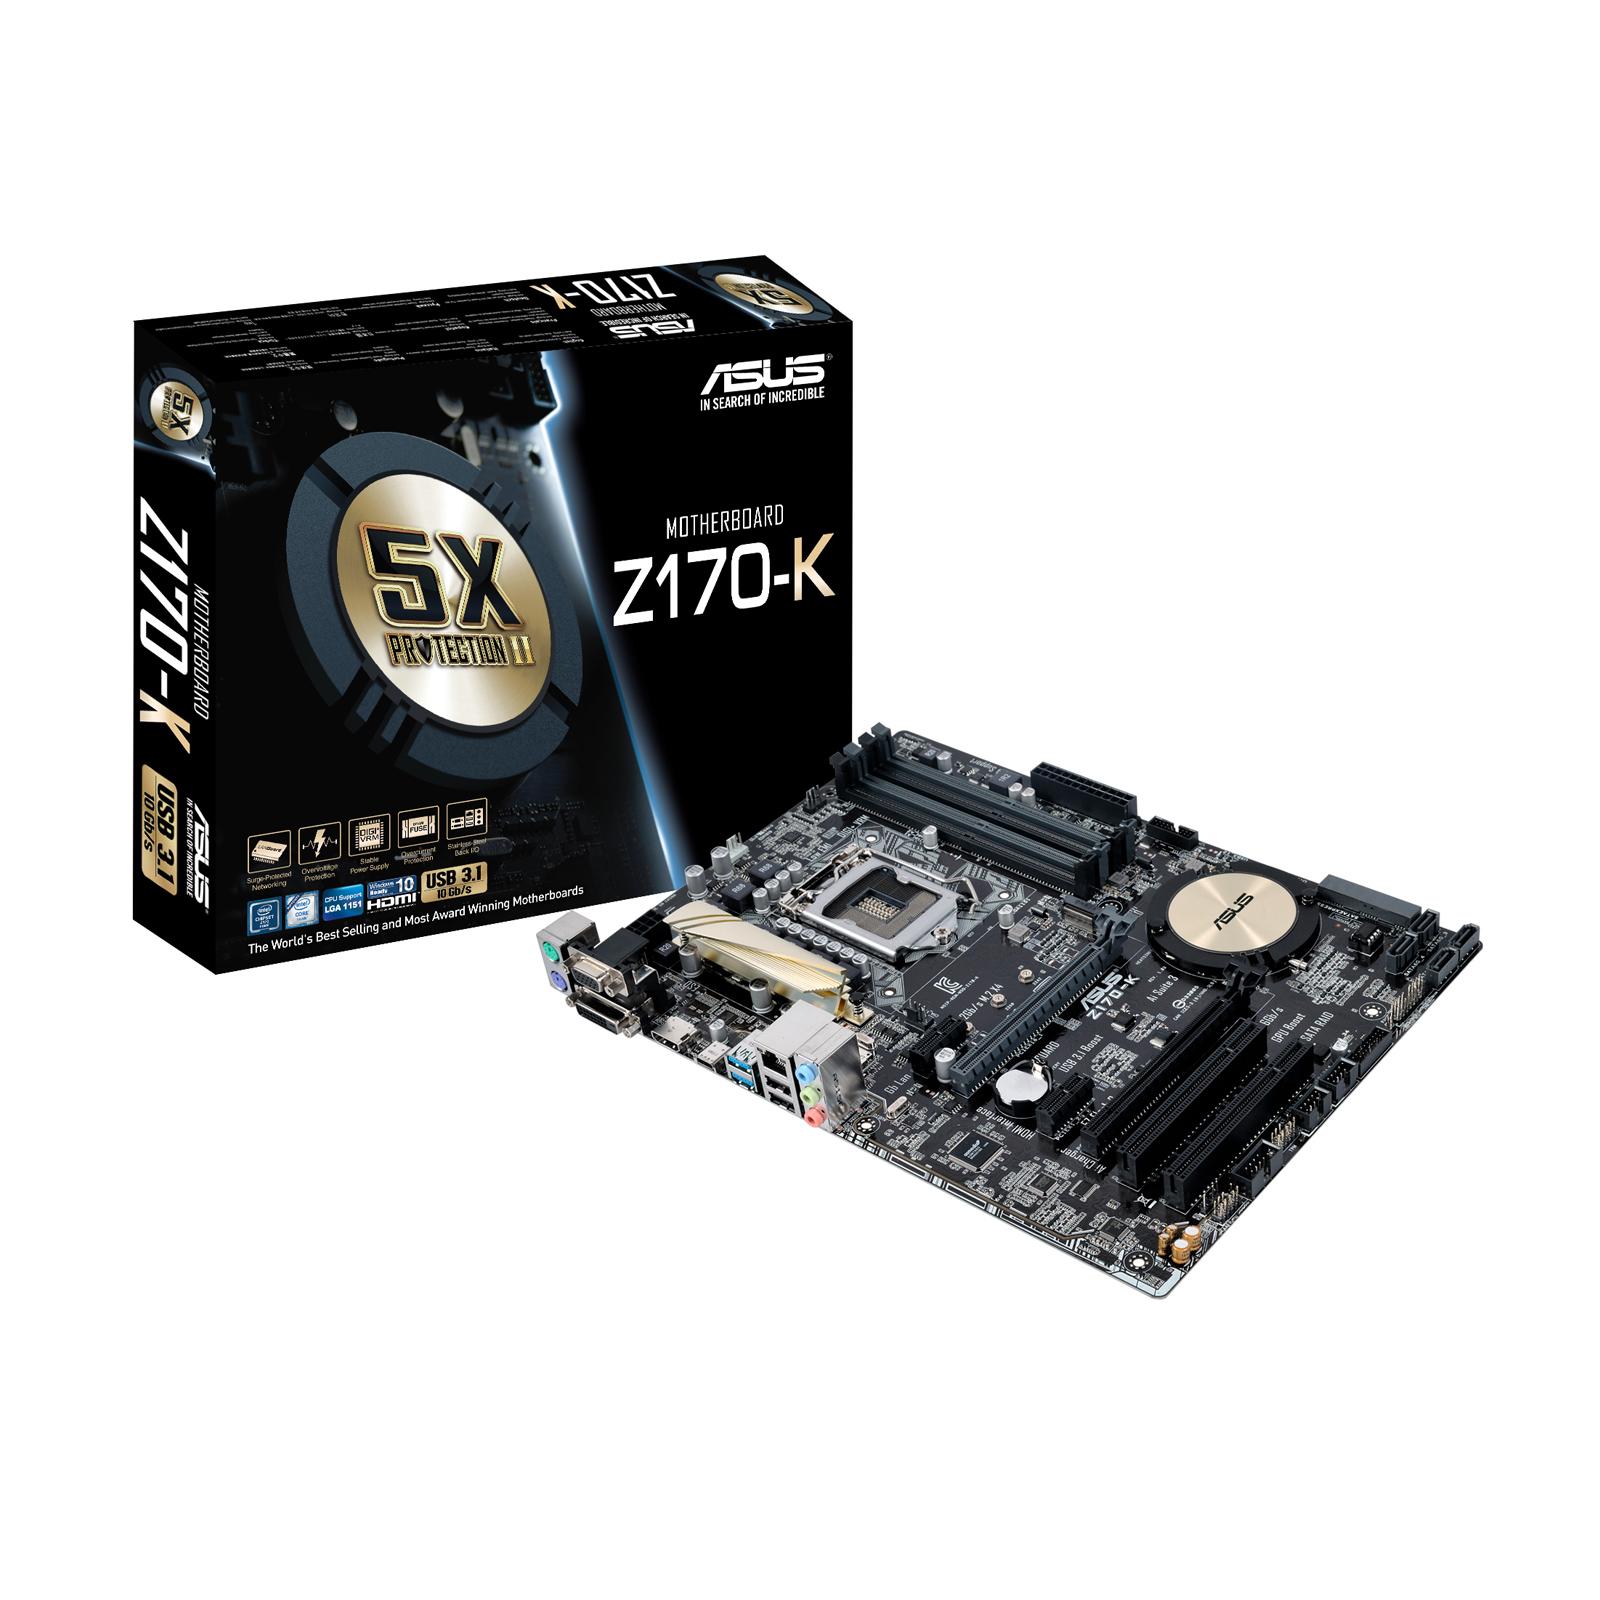 Carte mère ASUS Z170-K Carte mère ATX Socket 1151 Intel Z170 Express - SATA 6Gb/s + SATA Express + M.2 - USB 3.1 - 2x PCI-Express 3.0 16x